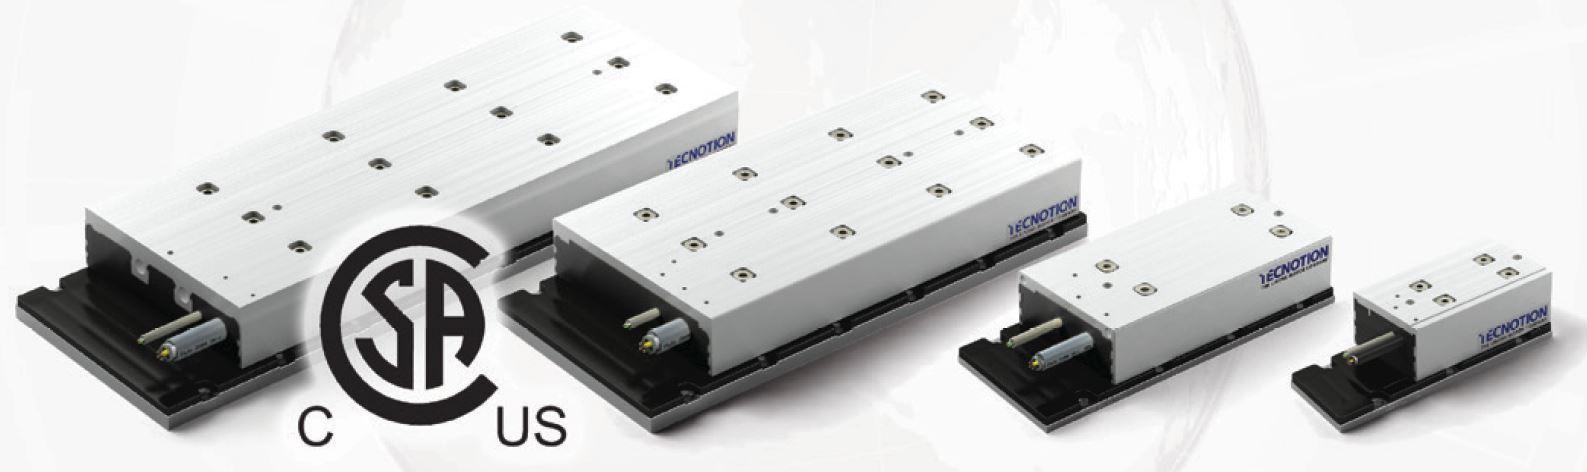 Tecnotion Linear Motors